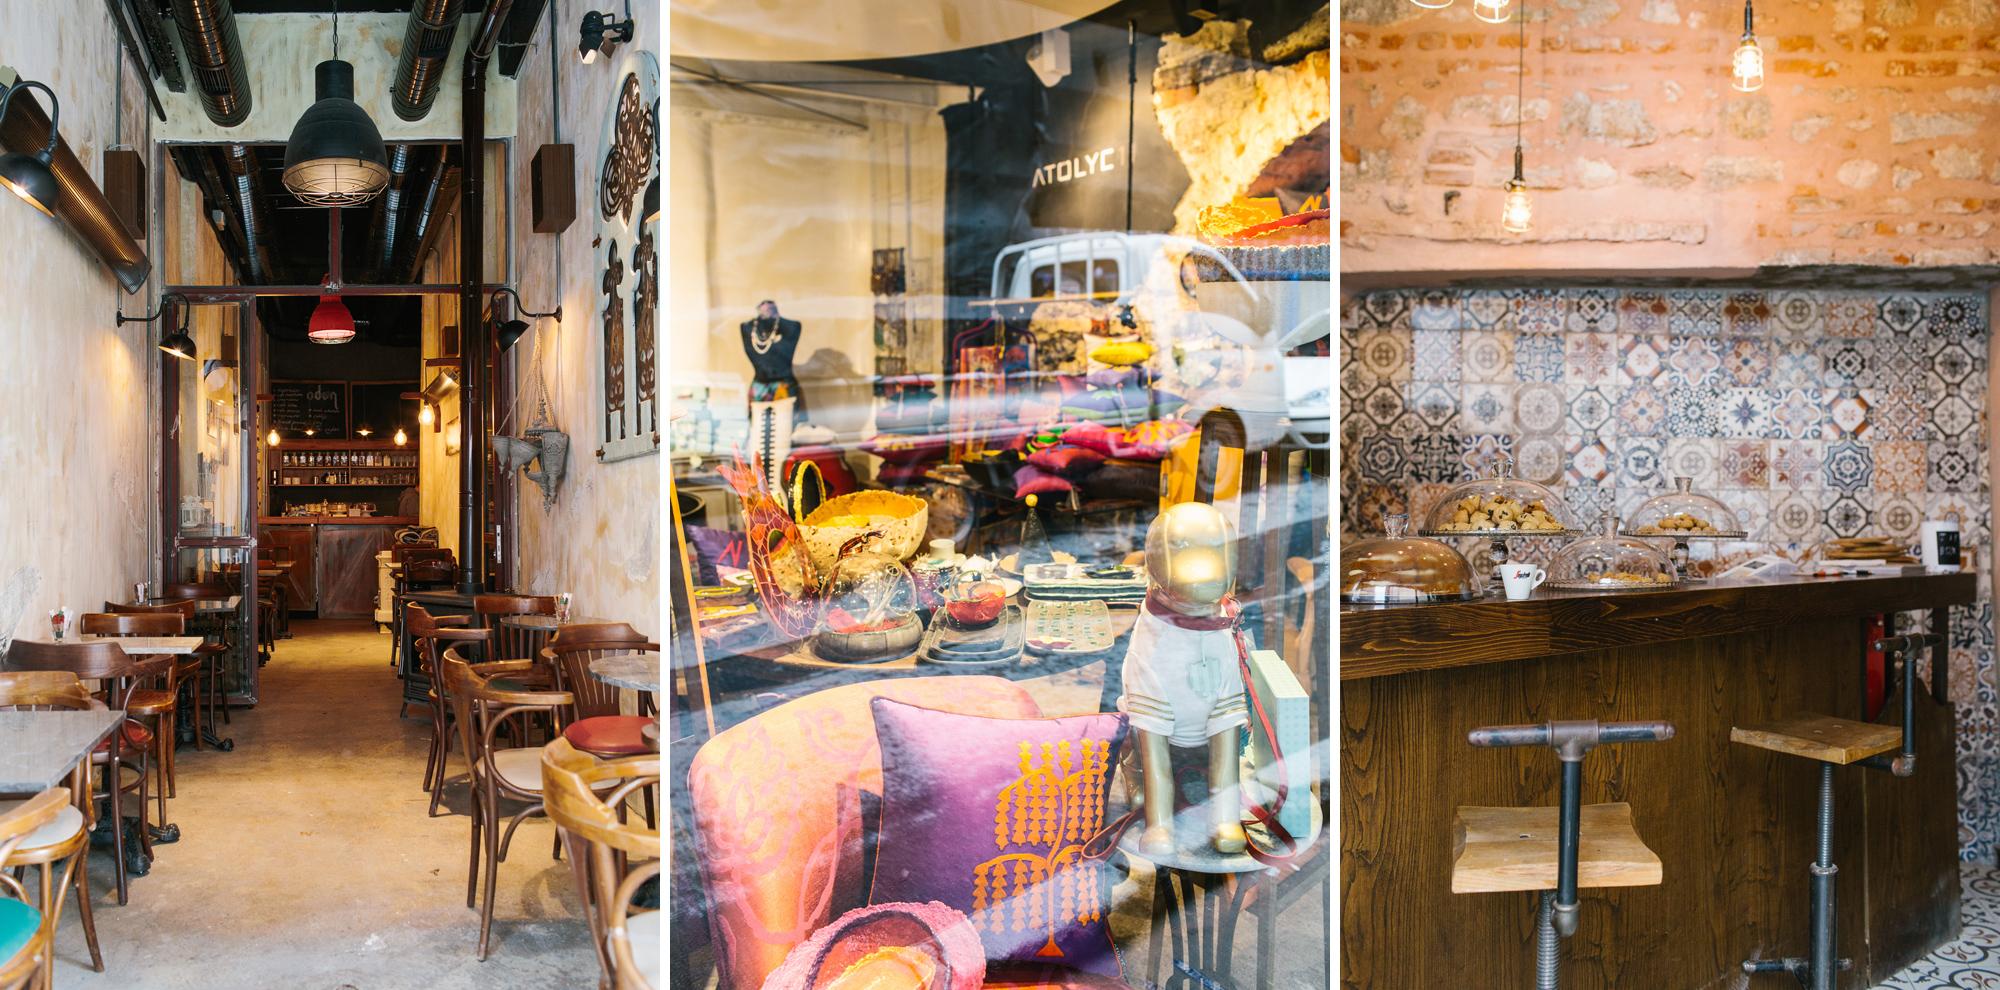 Istanbul_Coffee-AudiMagazine-FinnBeales-03.jpg